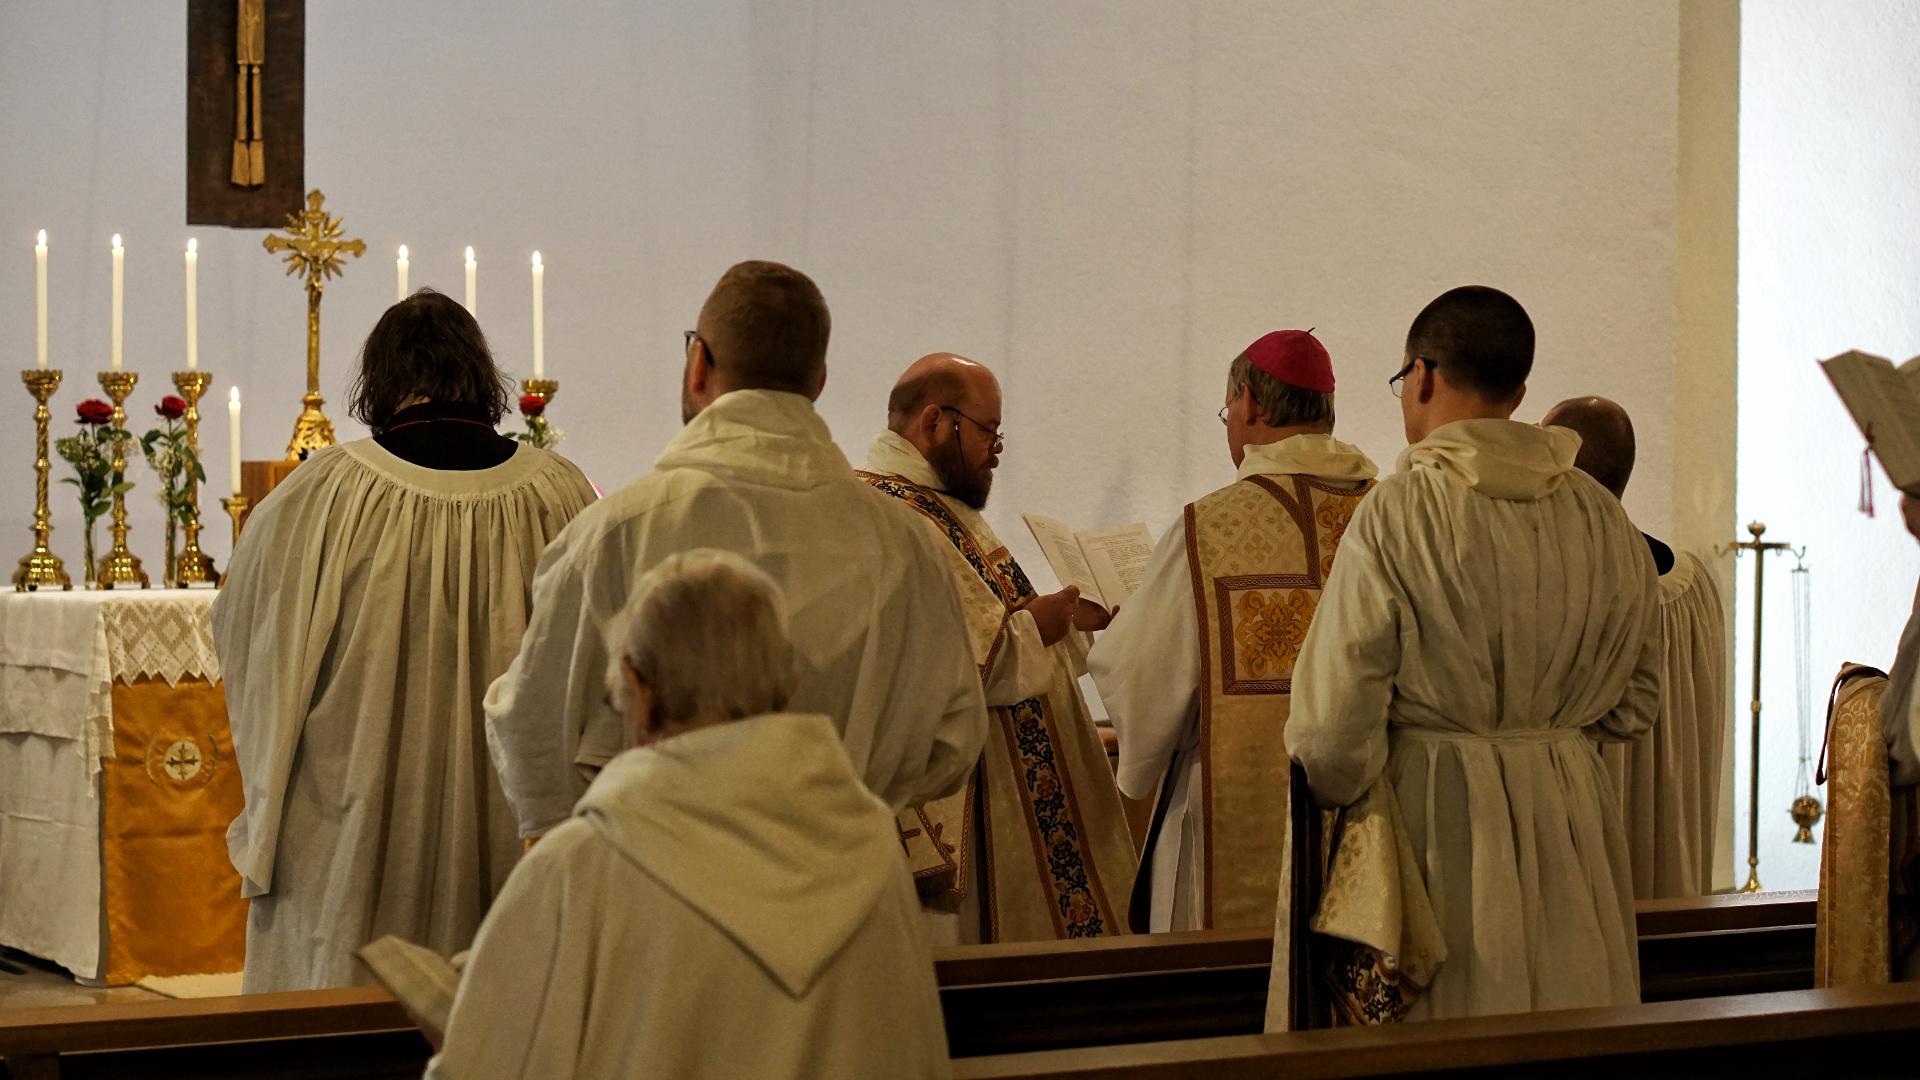 Subdiakonat 1 Osterkonvent Marburg 2018